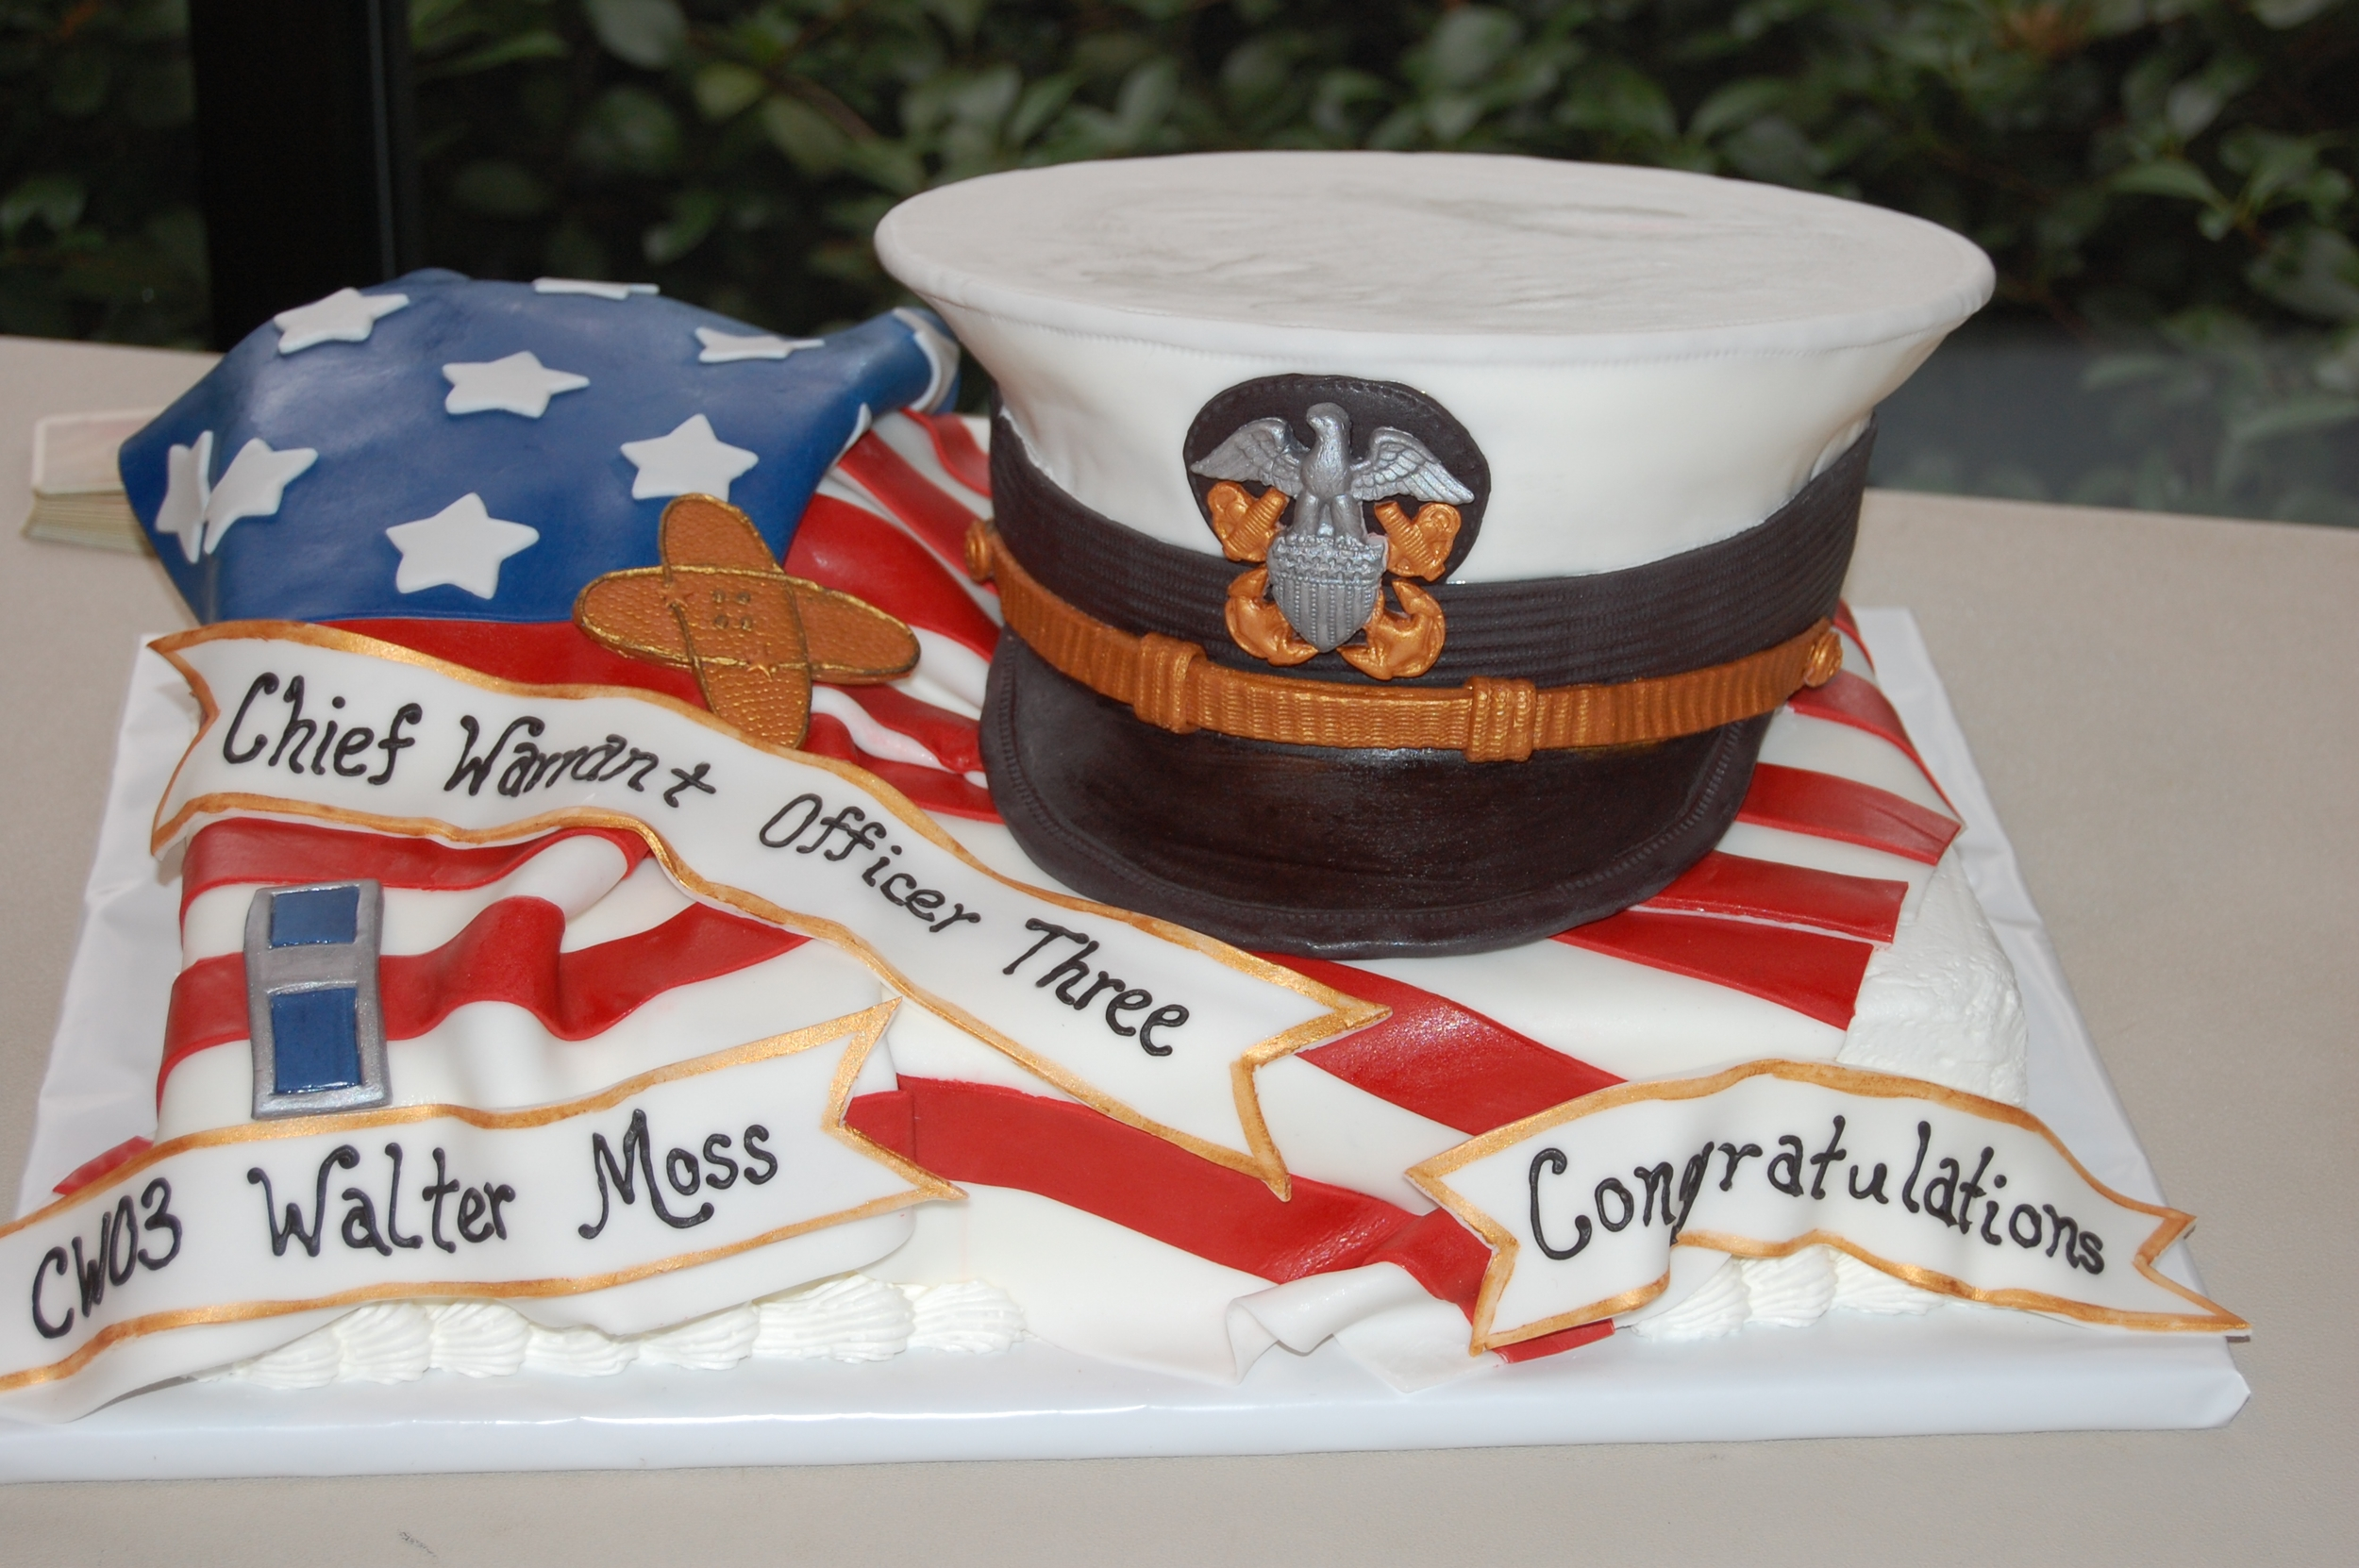 Moss Commissioning Cake.JPG